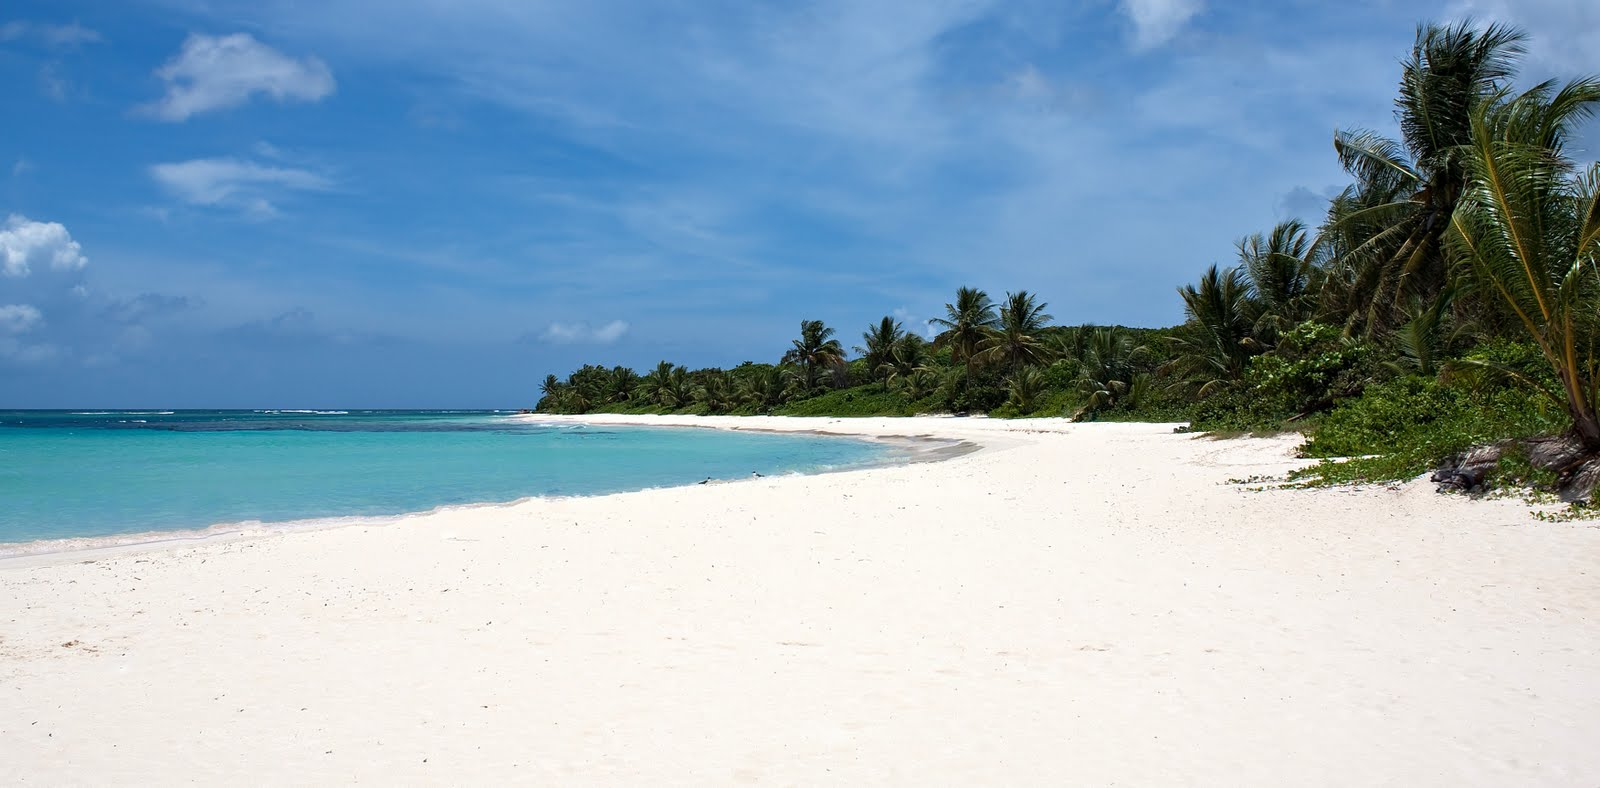 Mexico's Beaches